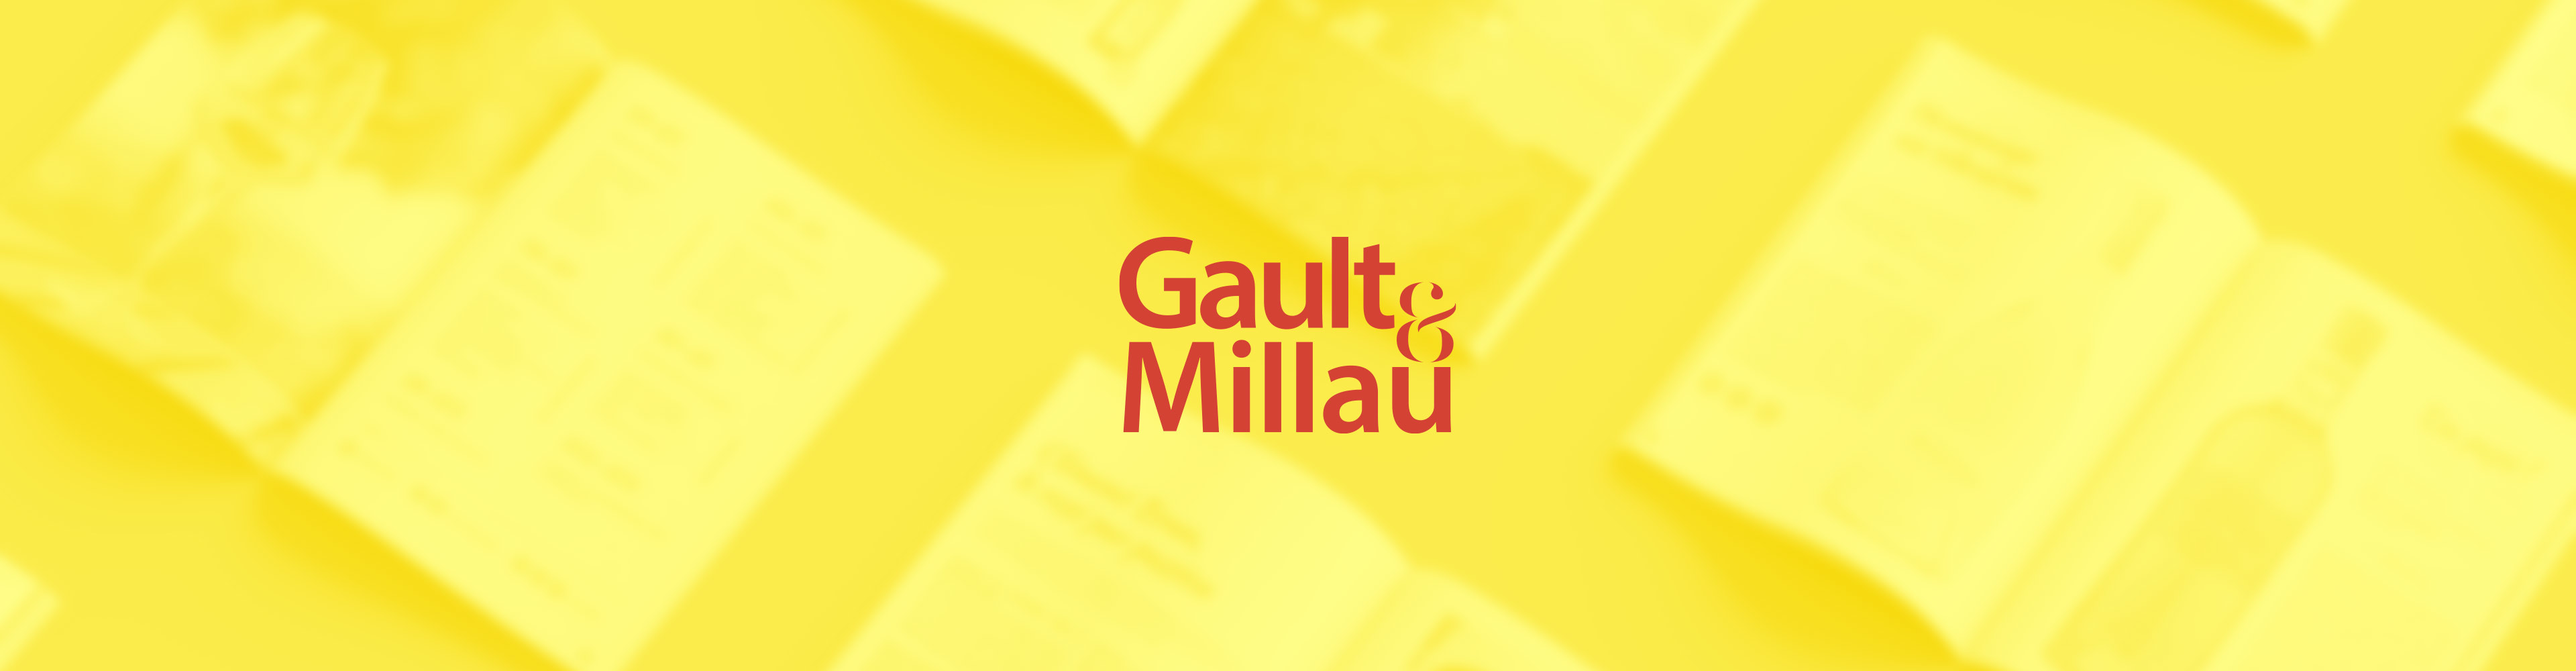 hero Gault&Millau